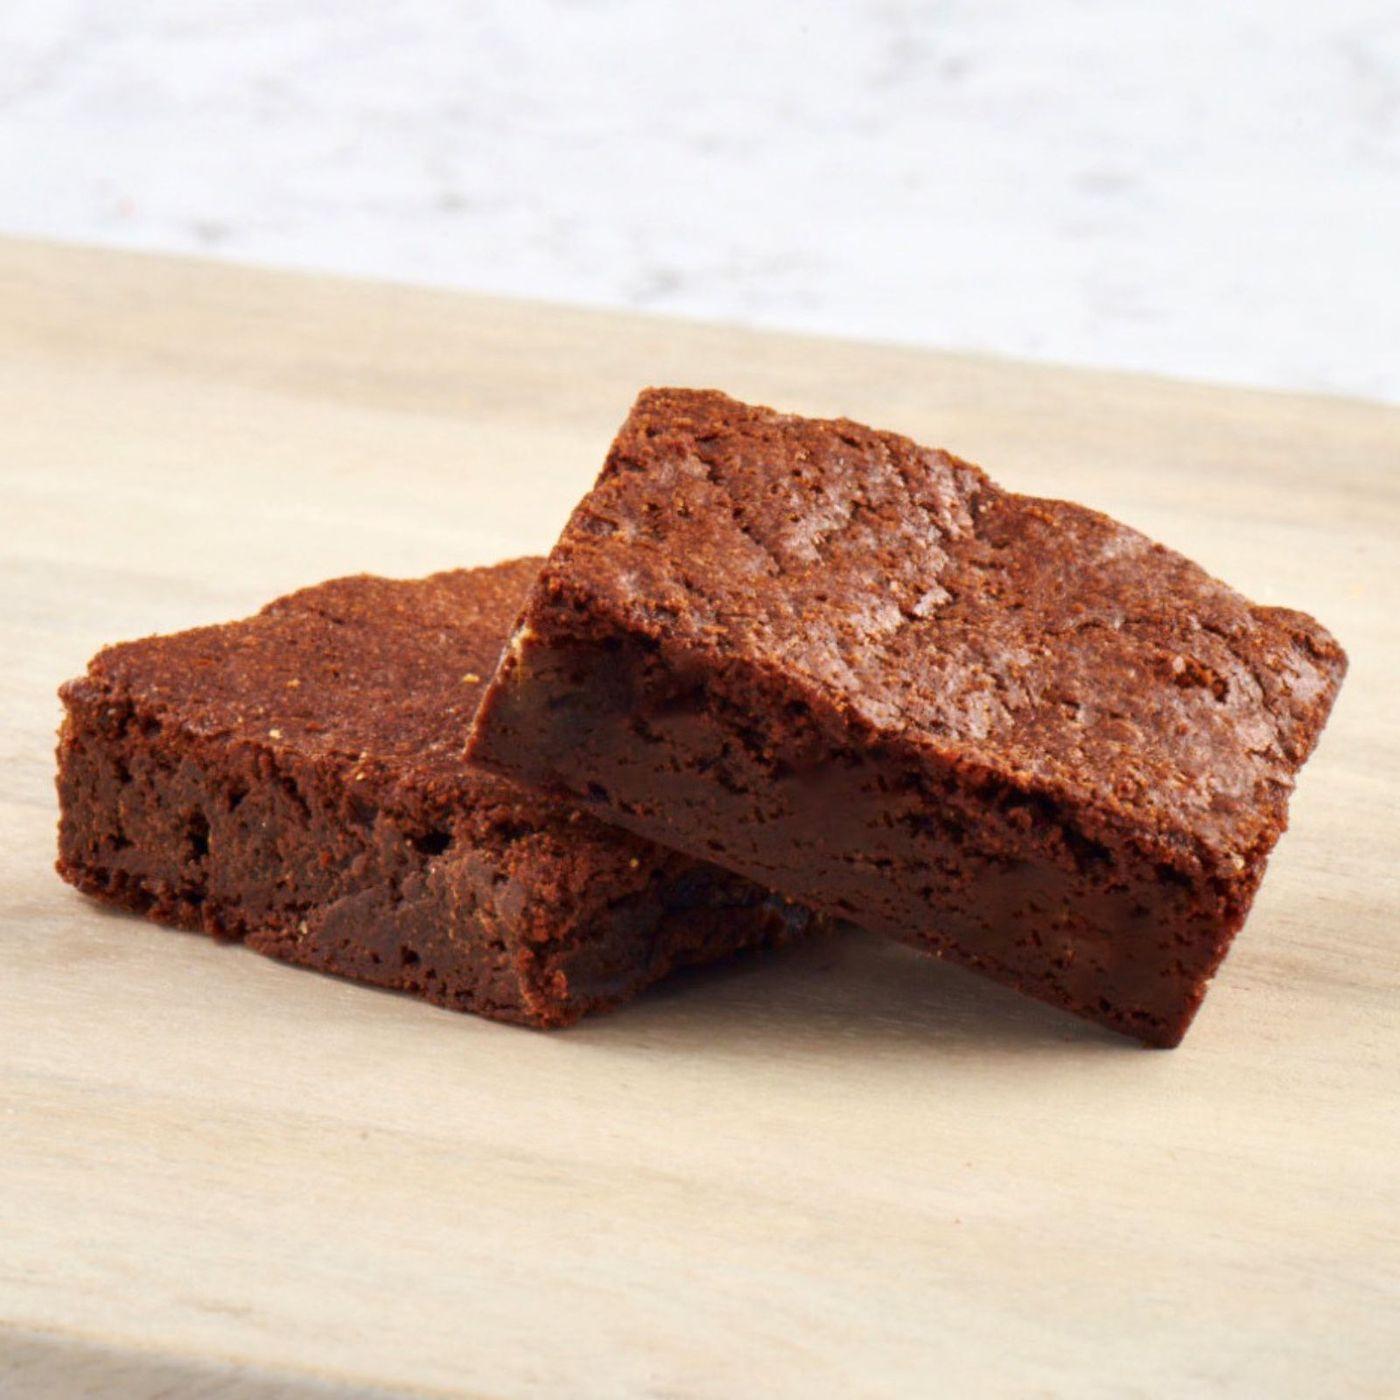 420 edibles | marijuana brownie recipe | 420 ganja goodies edibles